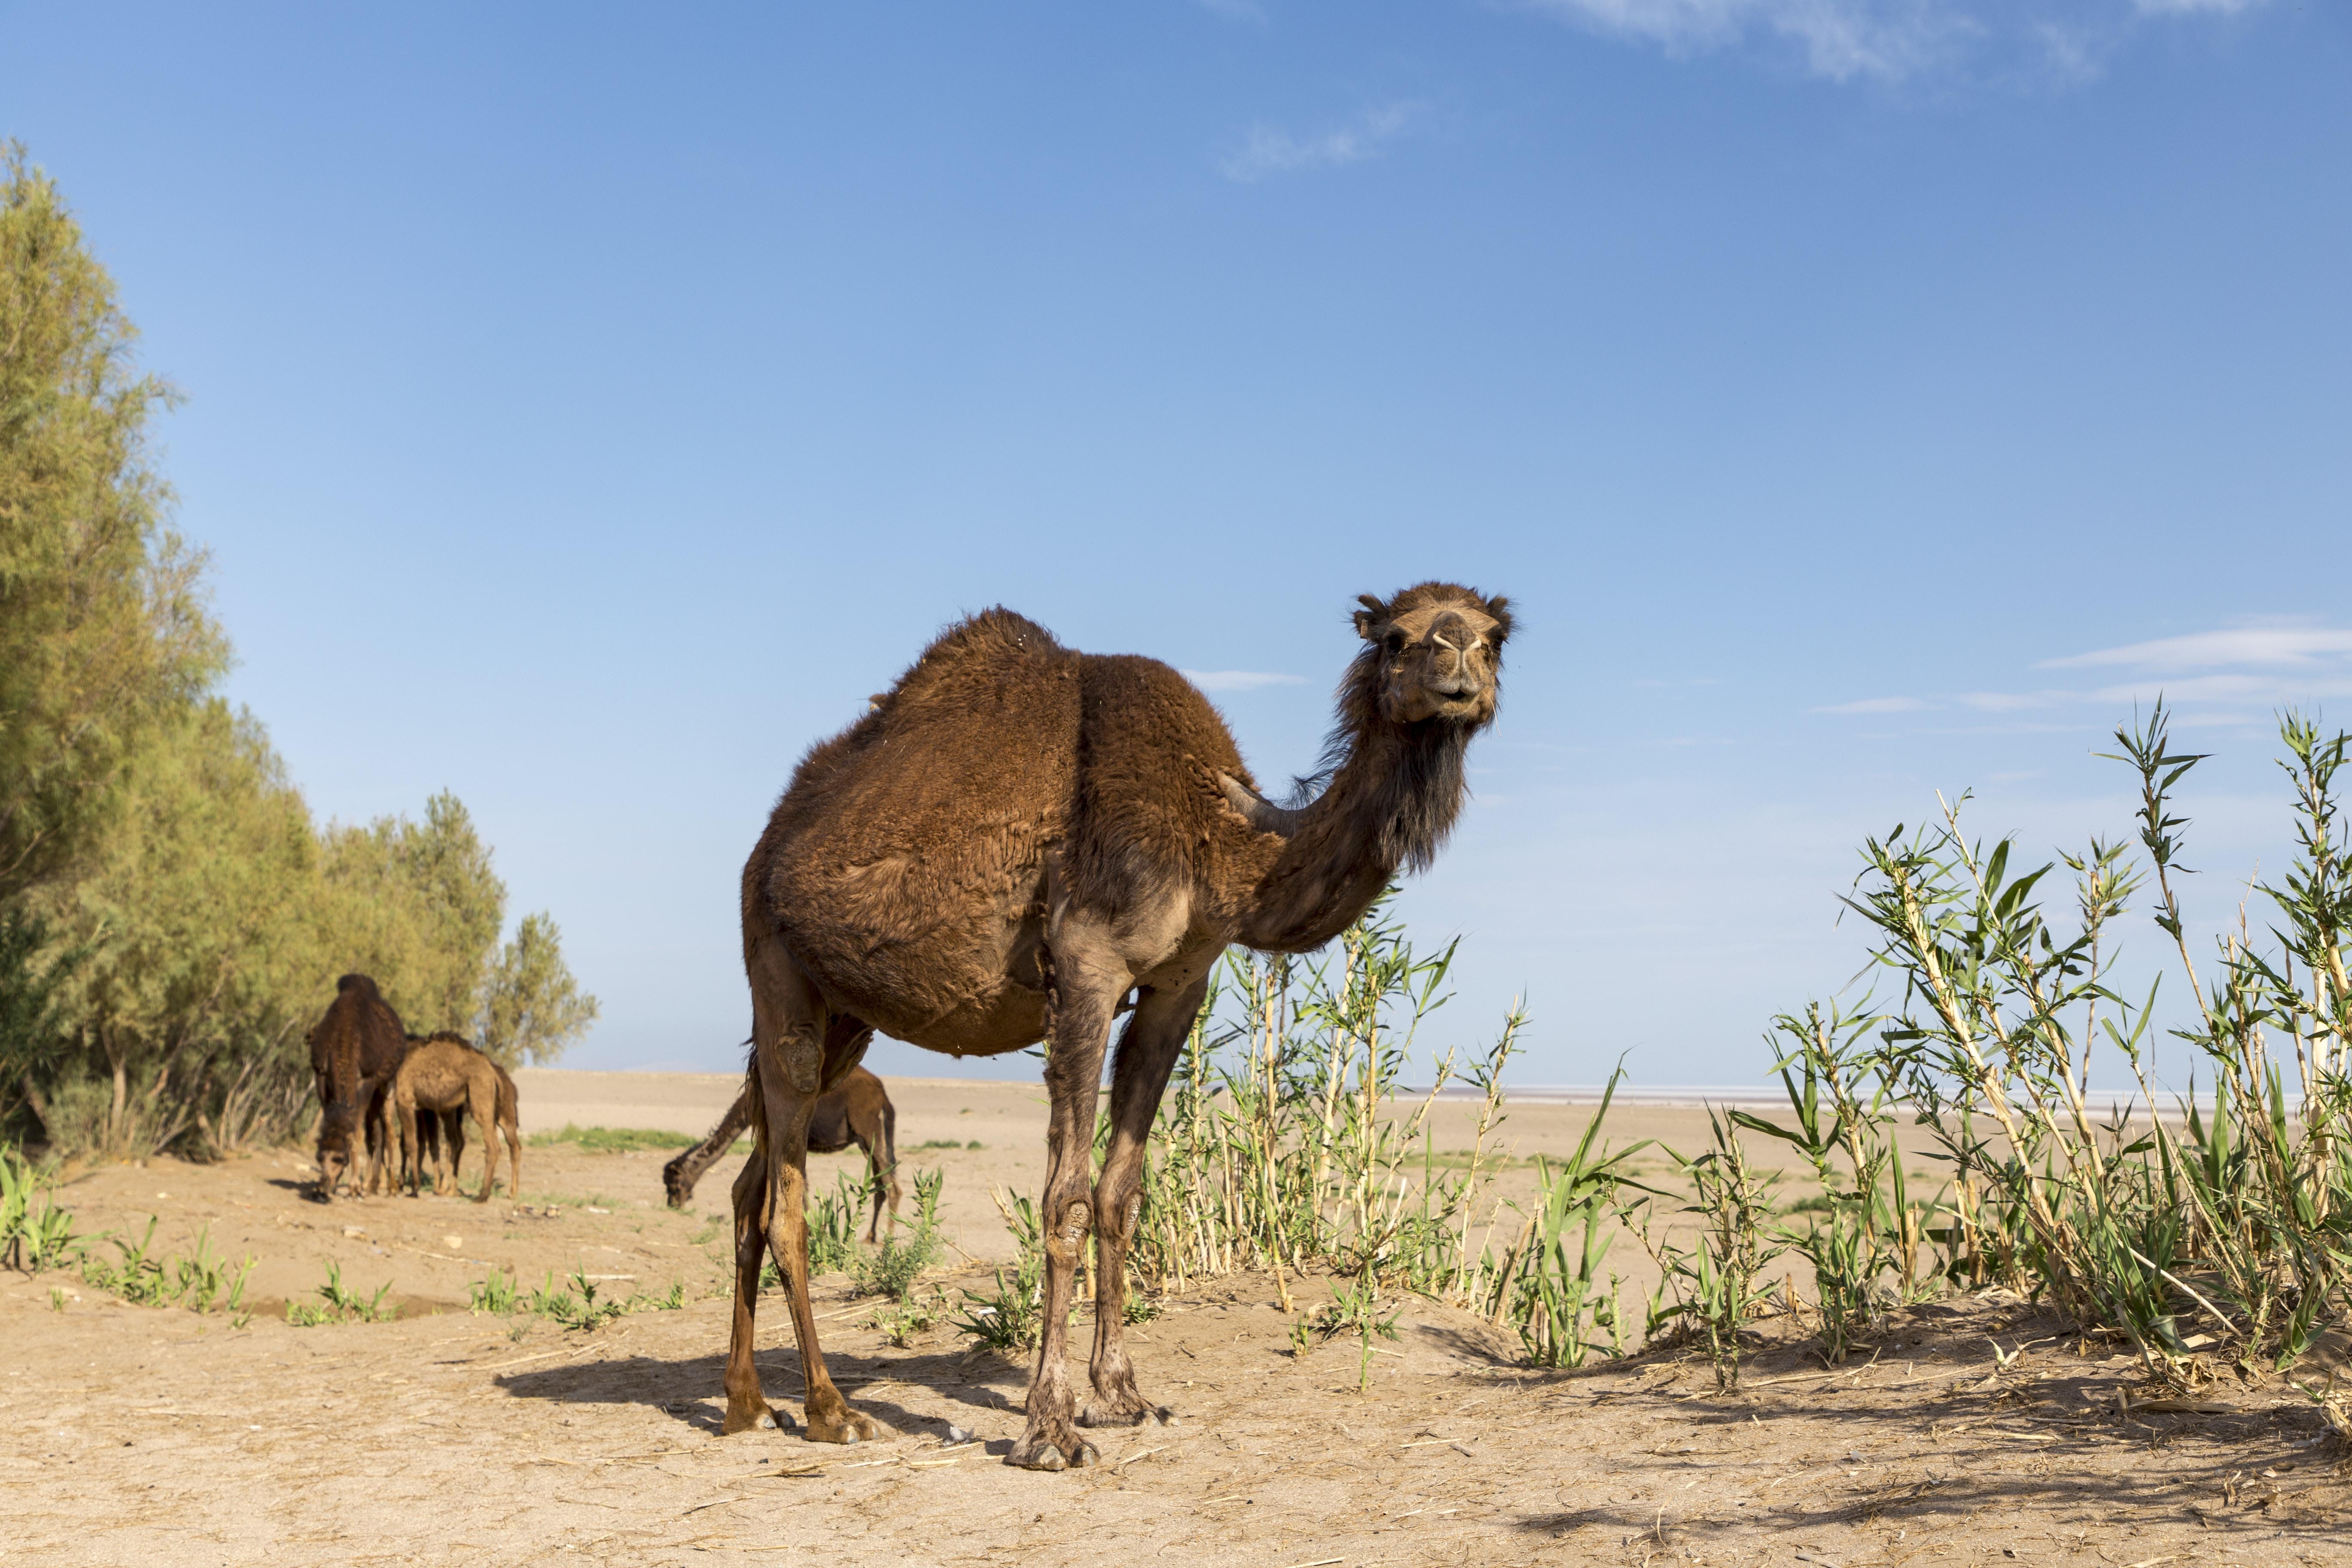 Camel in Maranjab desert